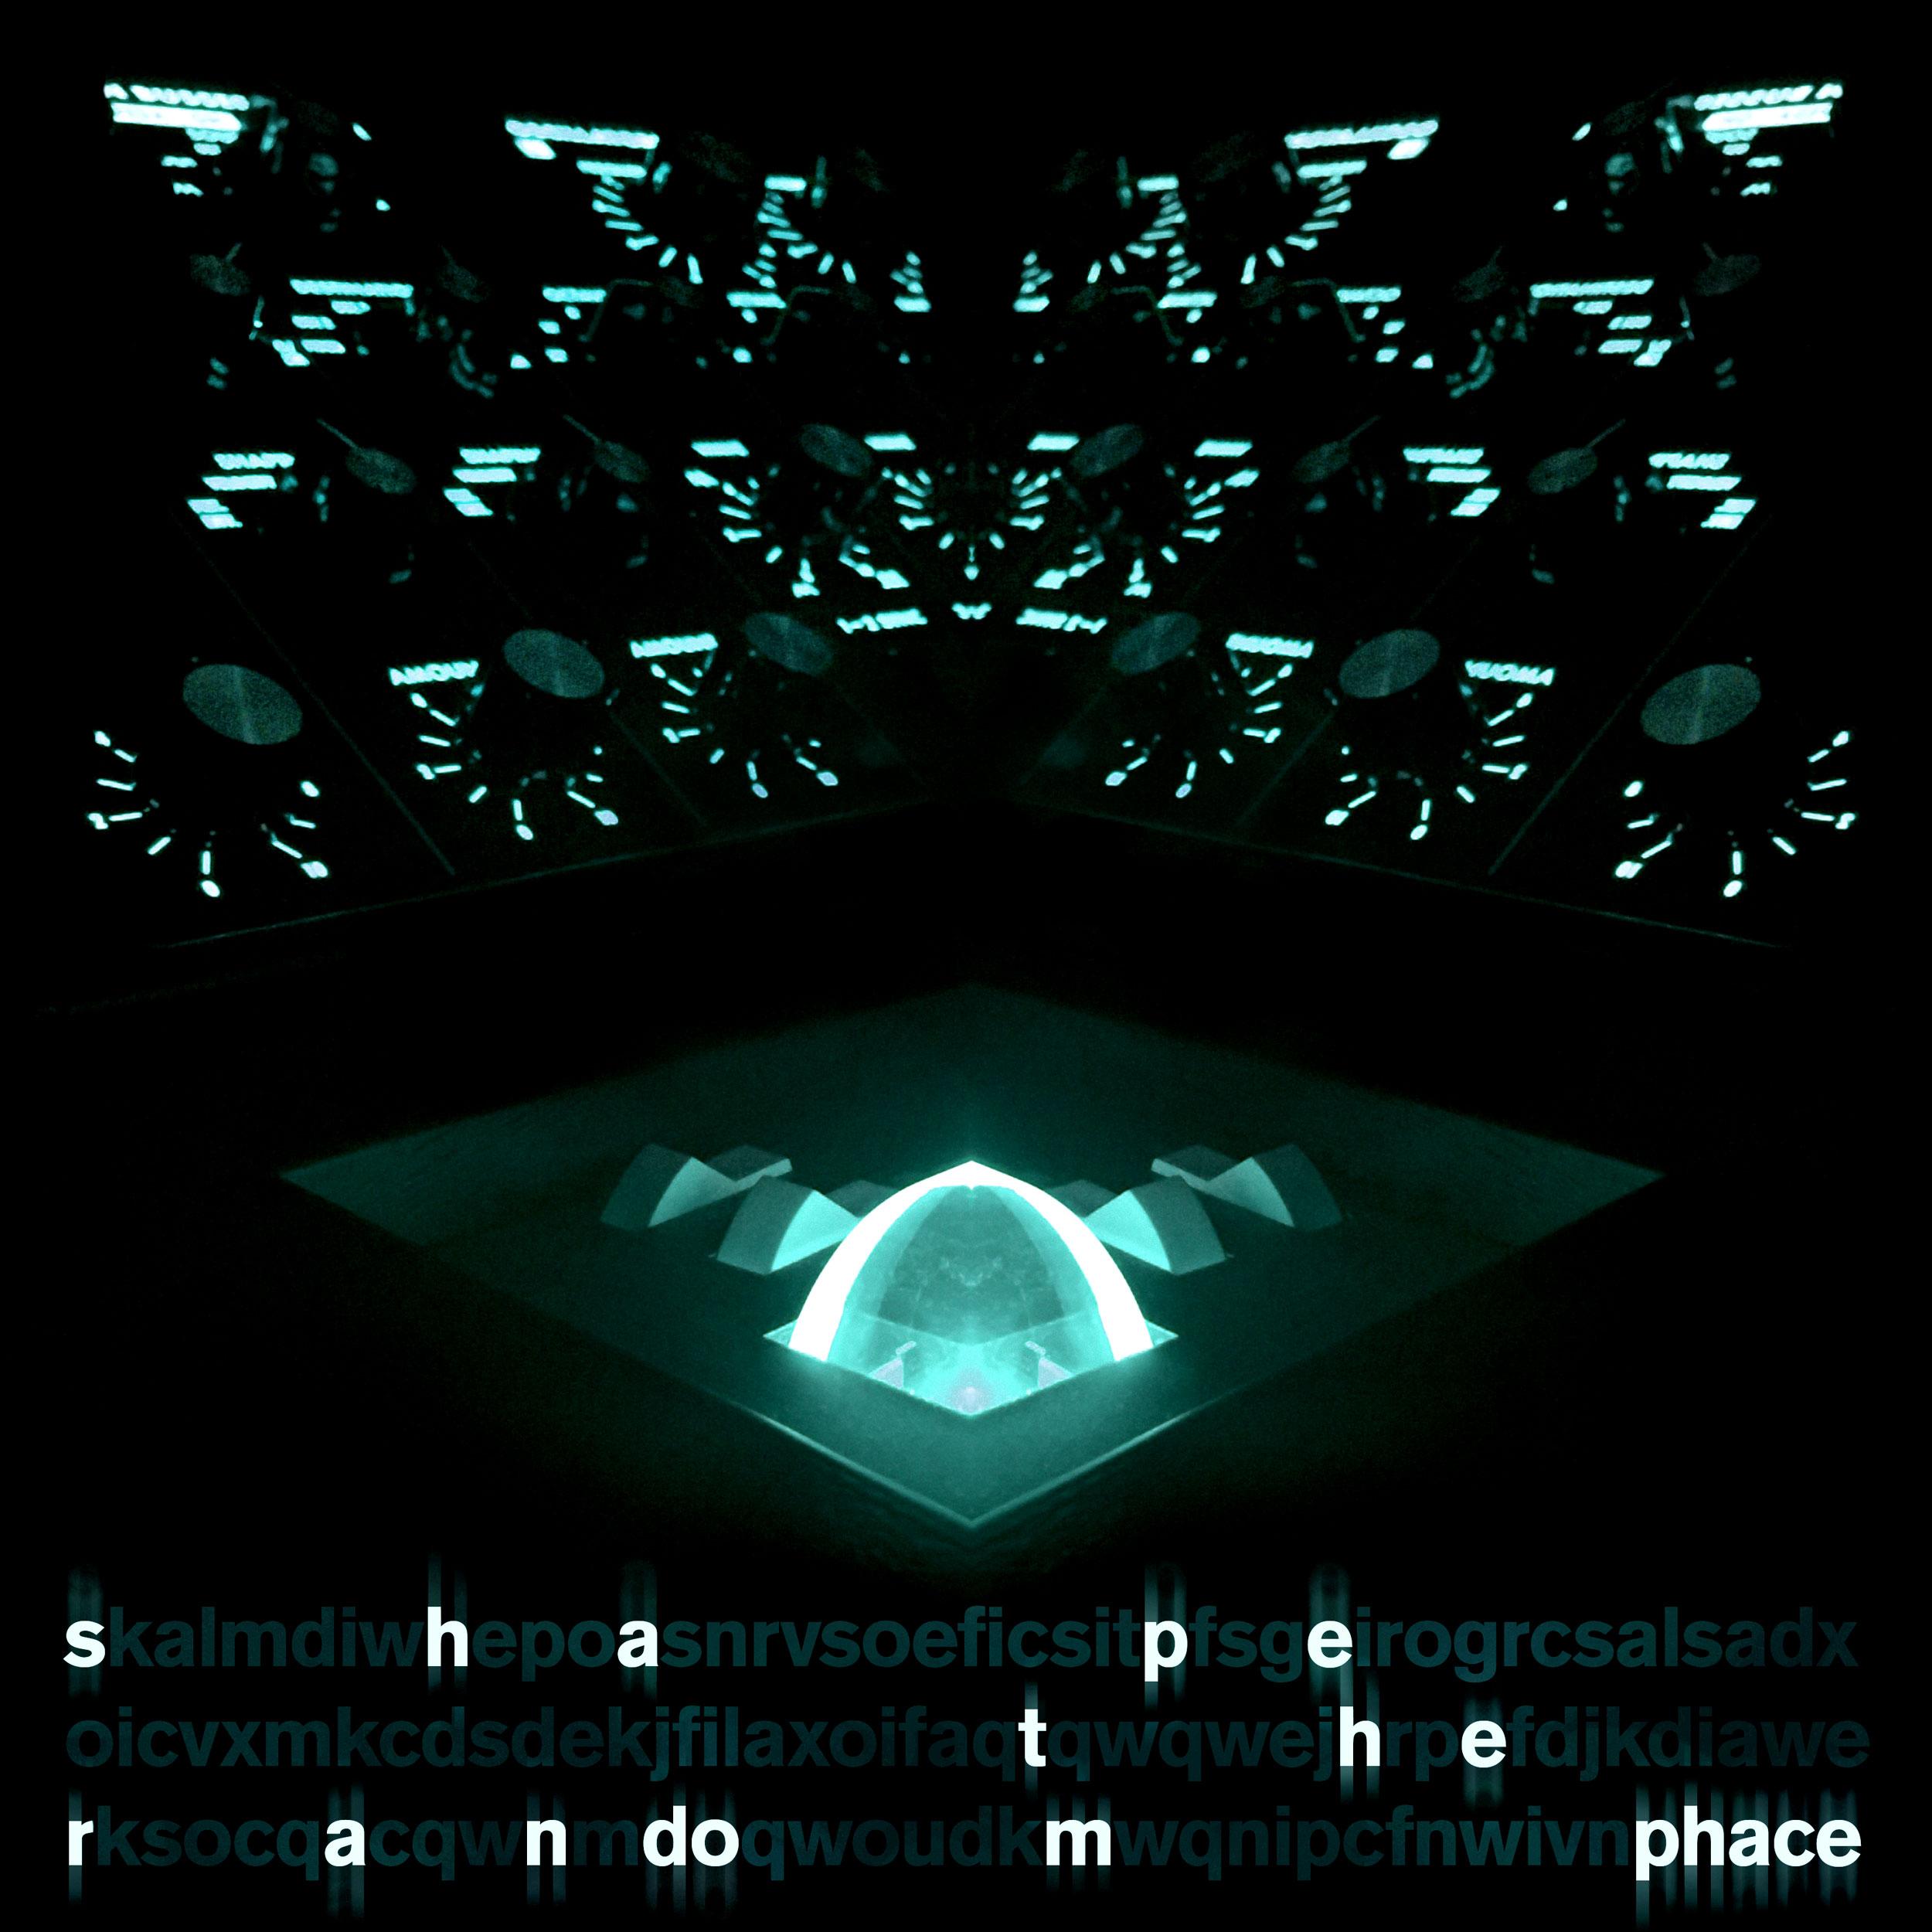 Phace/SHAPE THE RANDOM CD